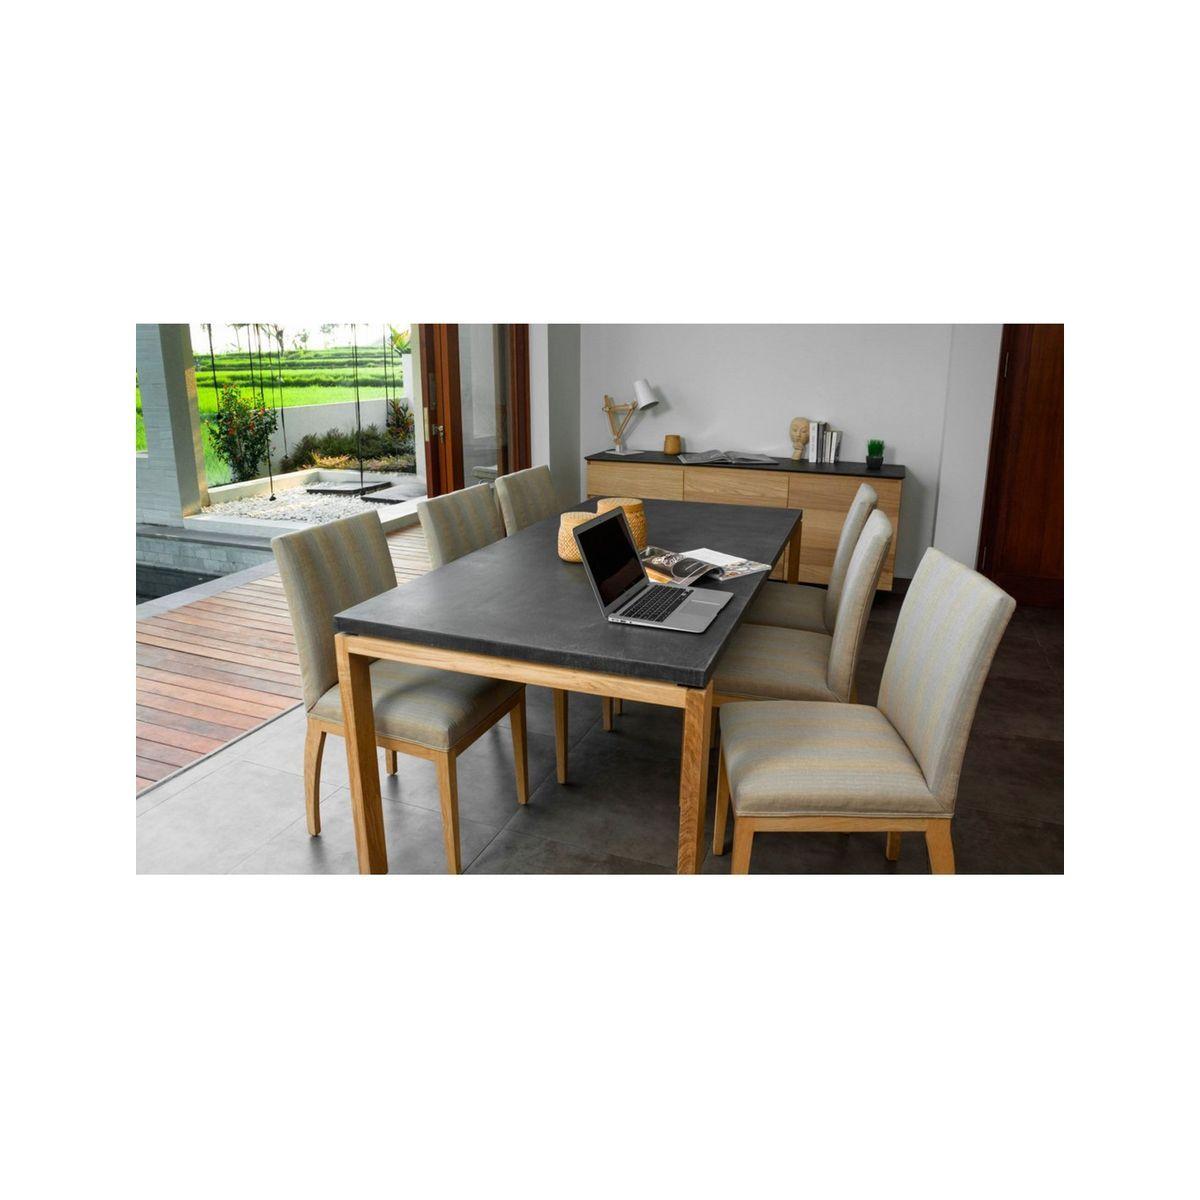 Massif Taille8 Cute Minéral Chêne Table pers Uleg Ju3lK1cTF